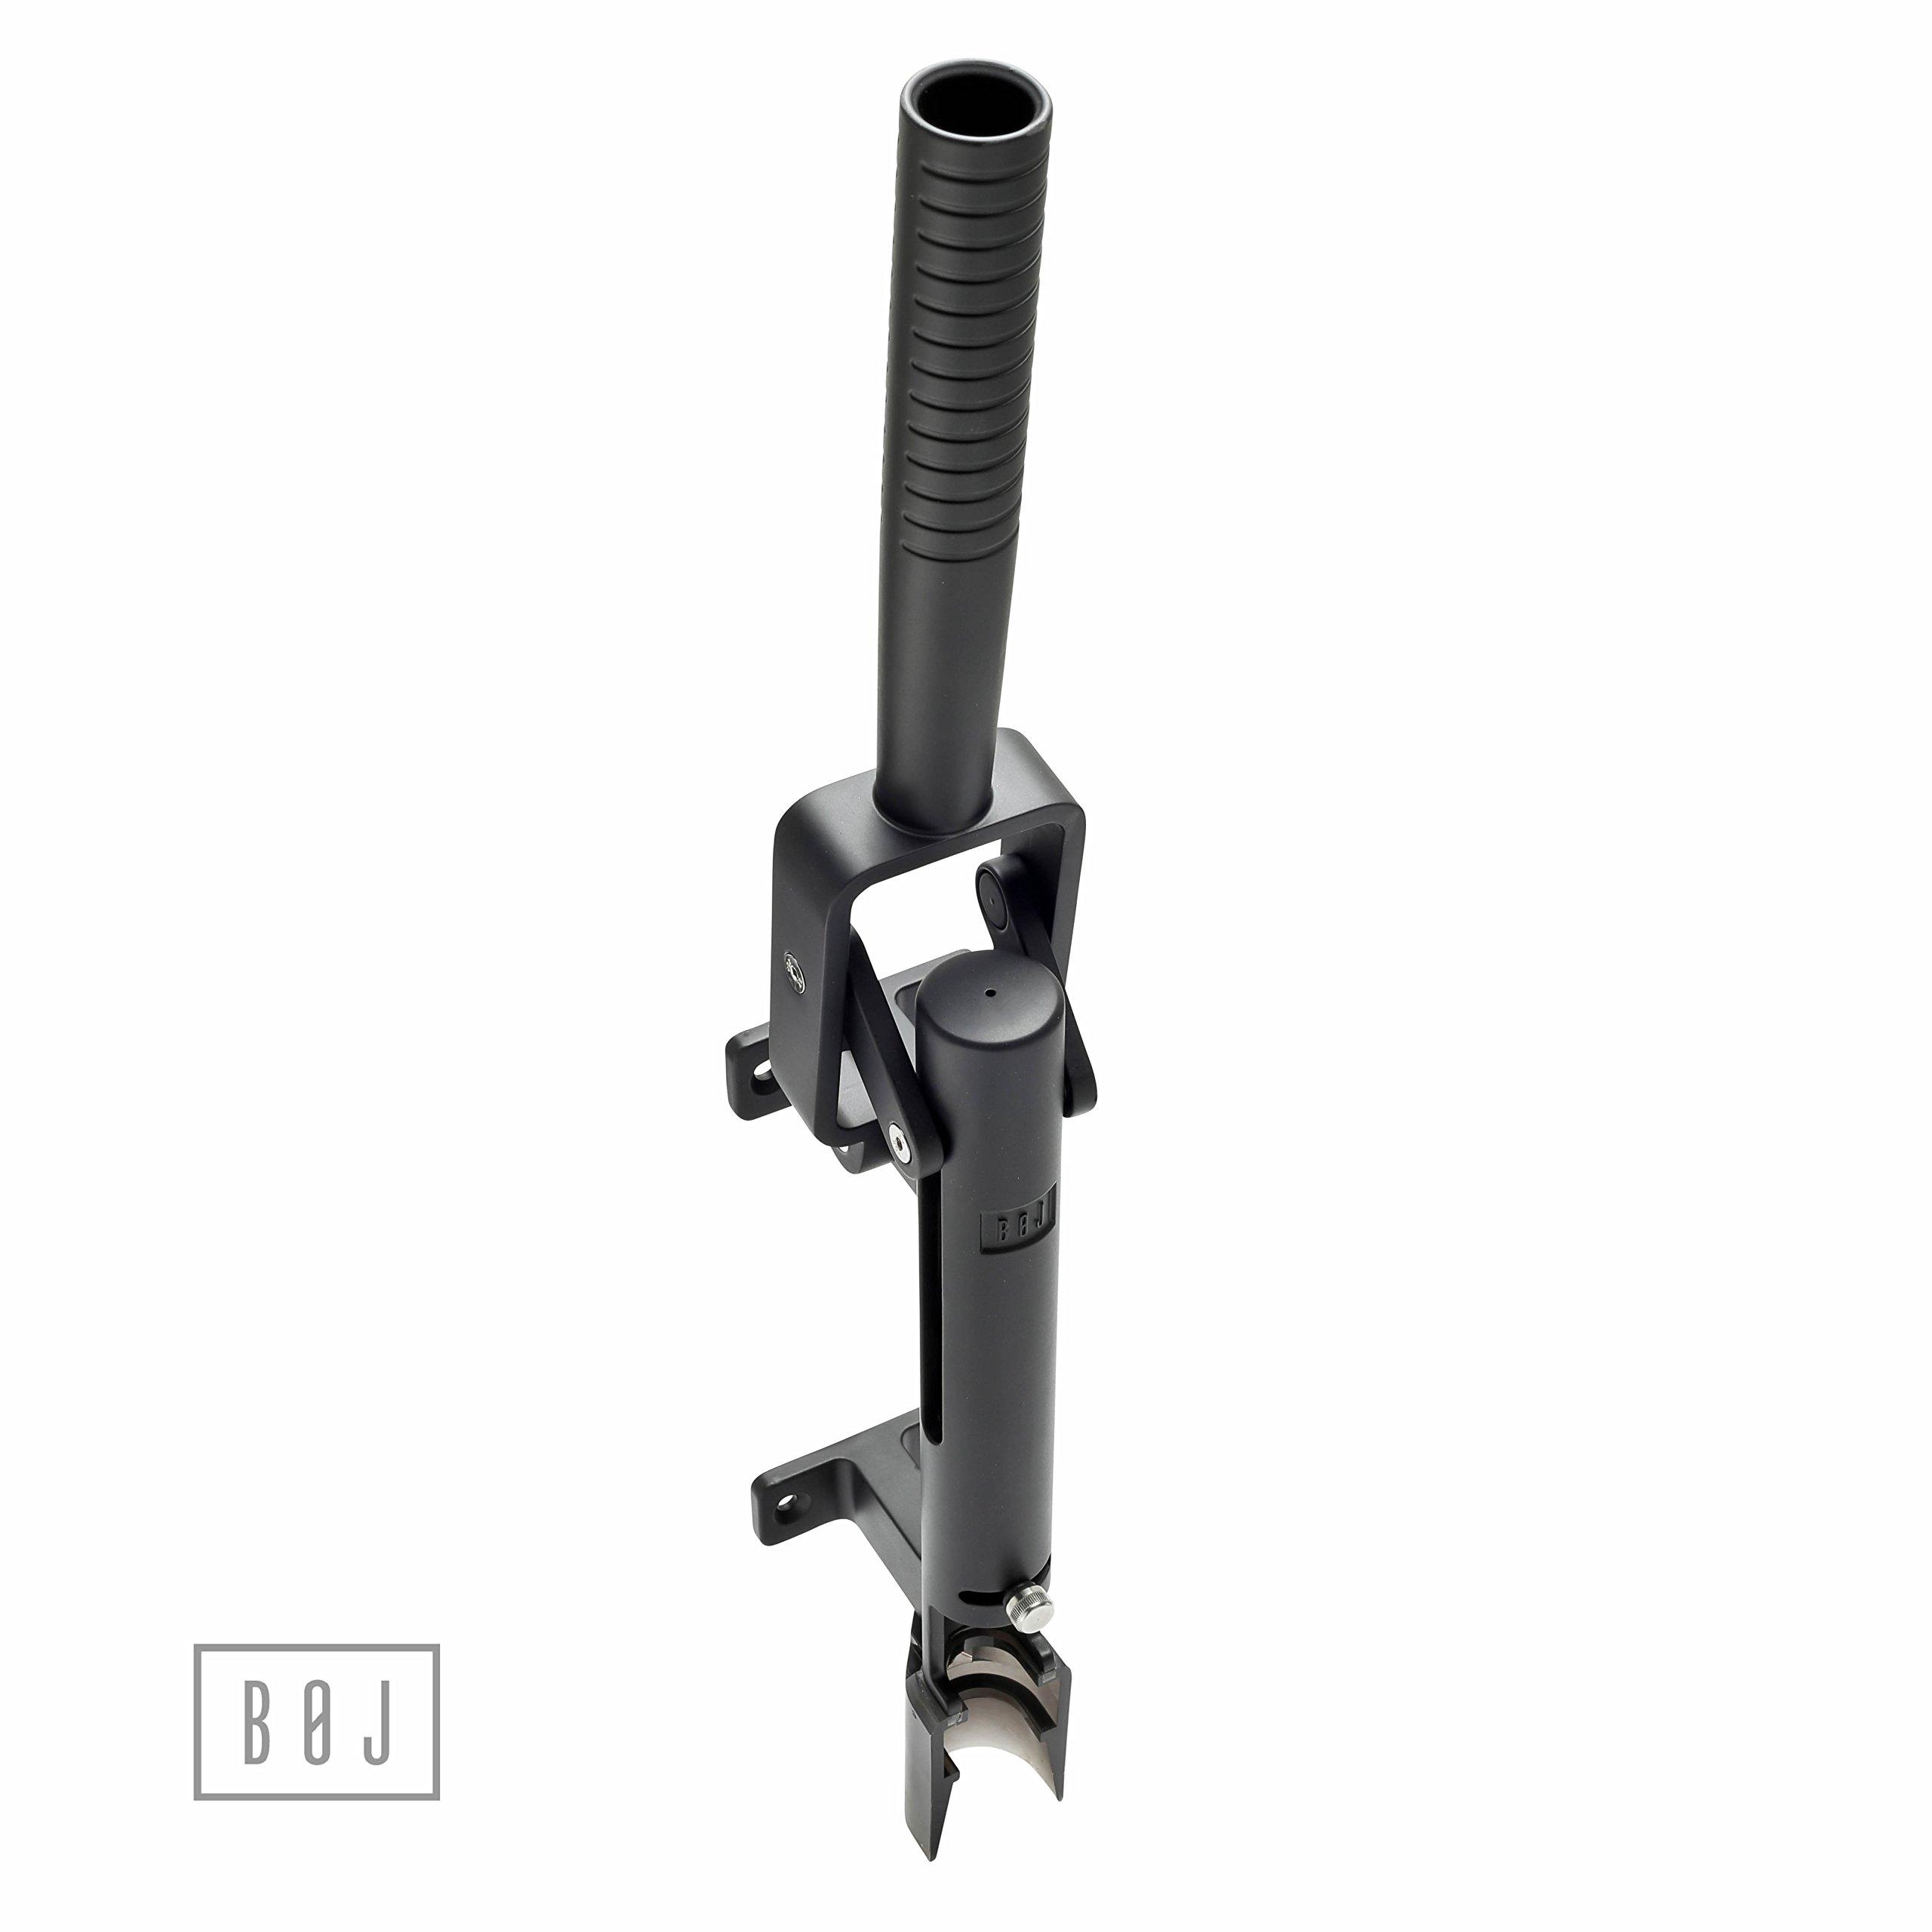 BOJ Professional Wall-mounted Corkscrew Model 110 US (Black)